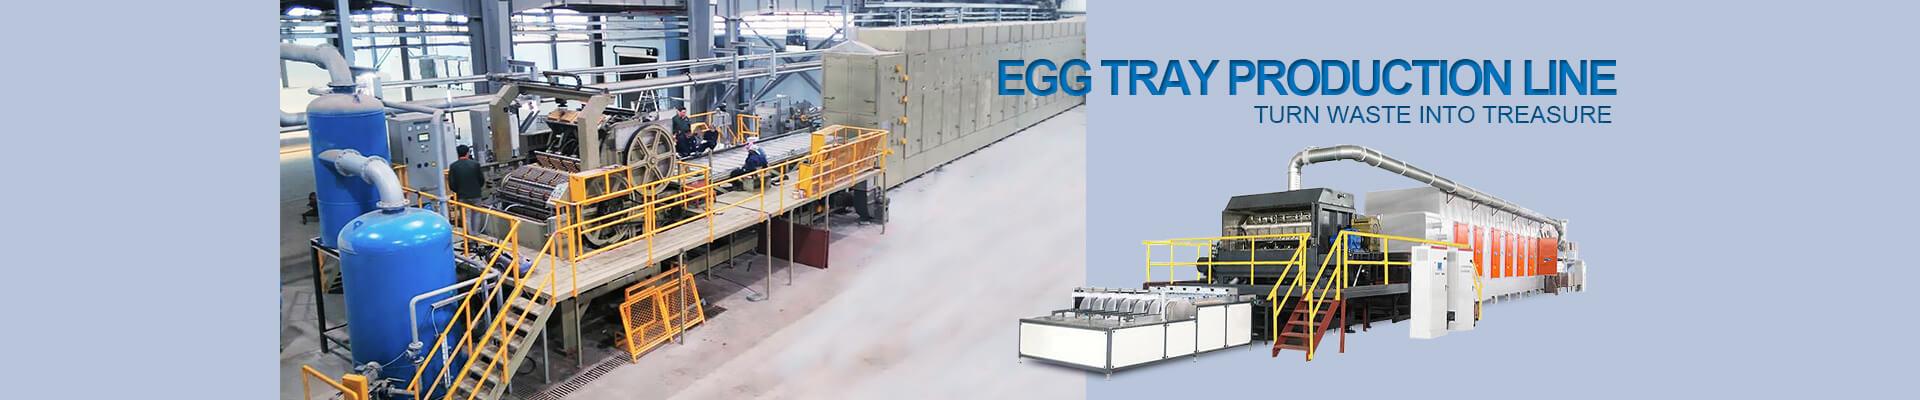 India customers visit egg tray machine